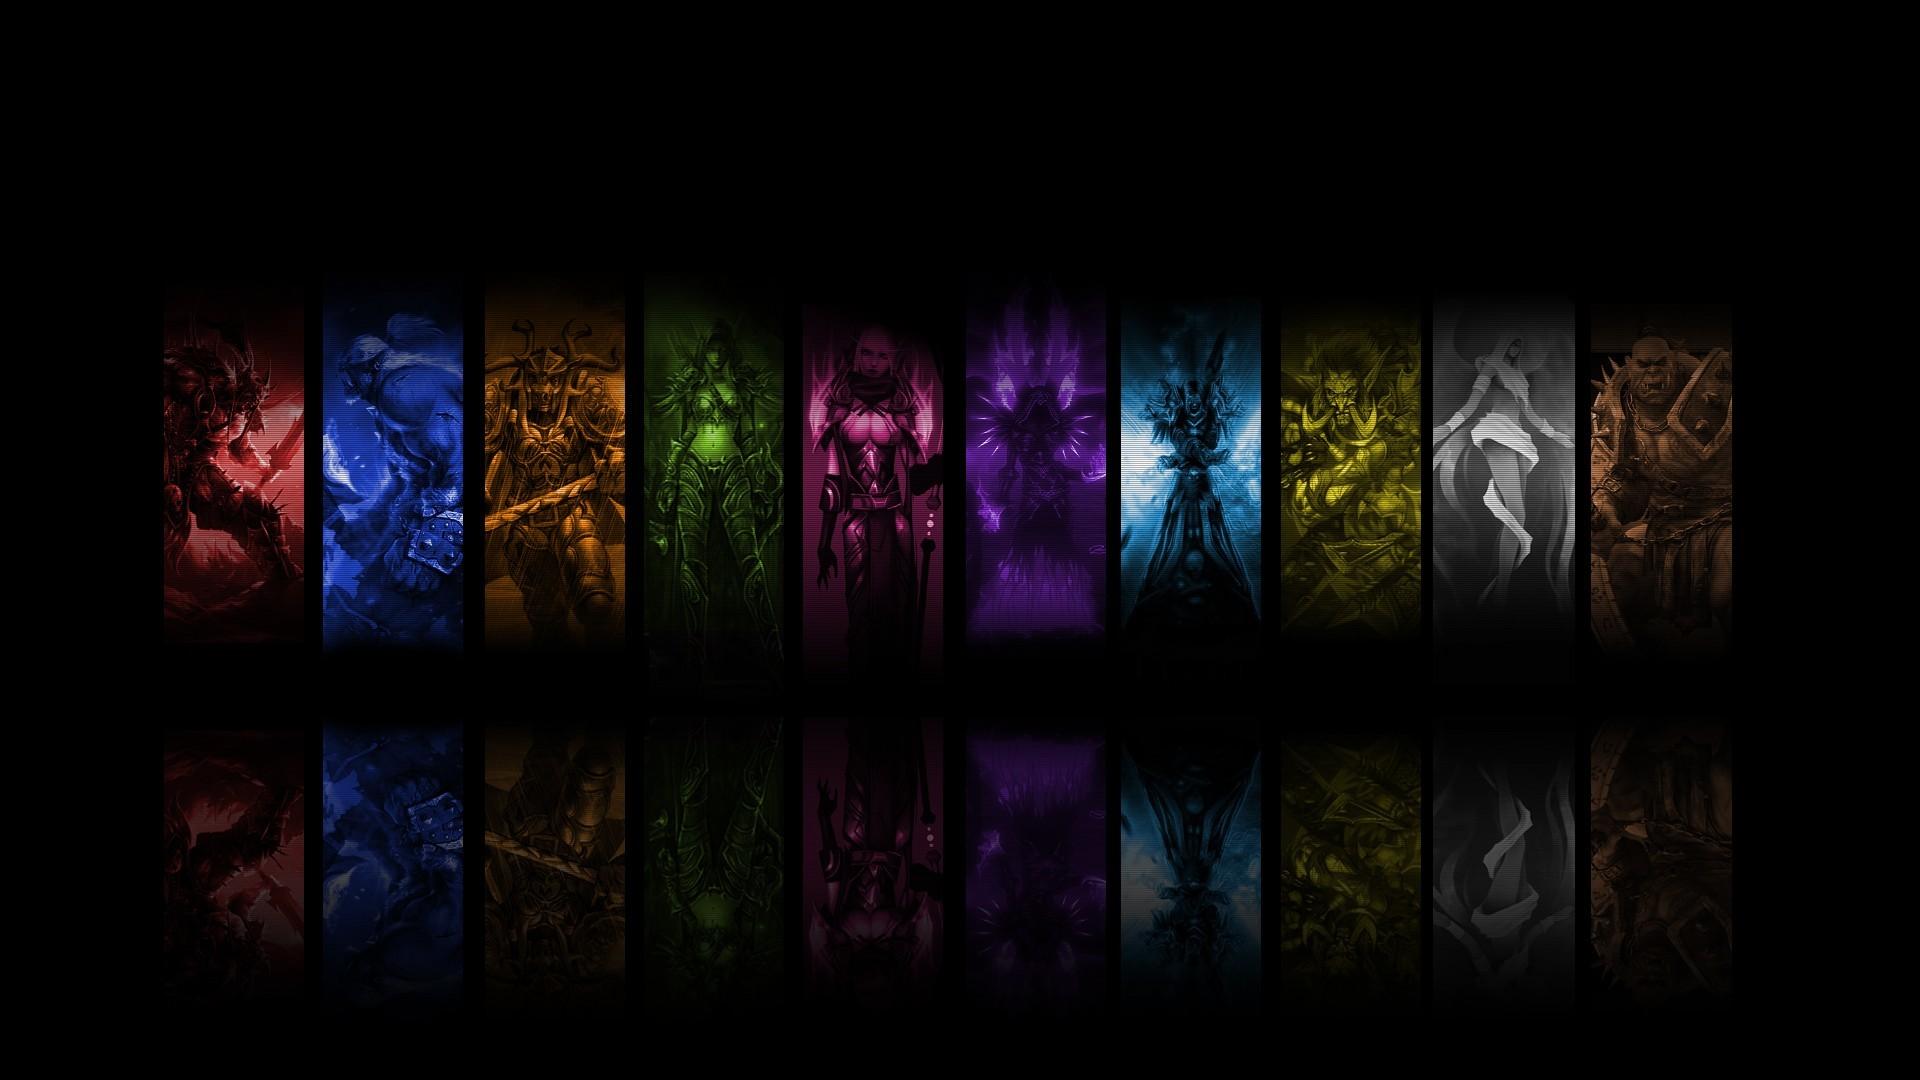 Death Knight Druid Mage Paladin Priest Rogue Shaman Warriors World Of  Warcraft